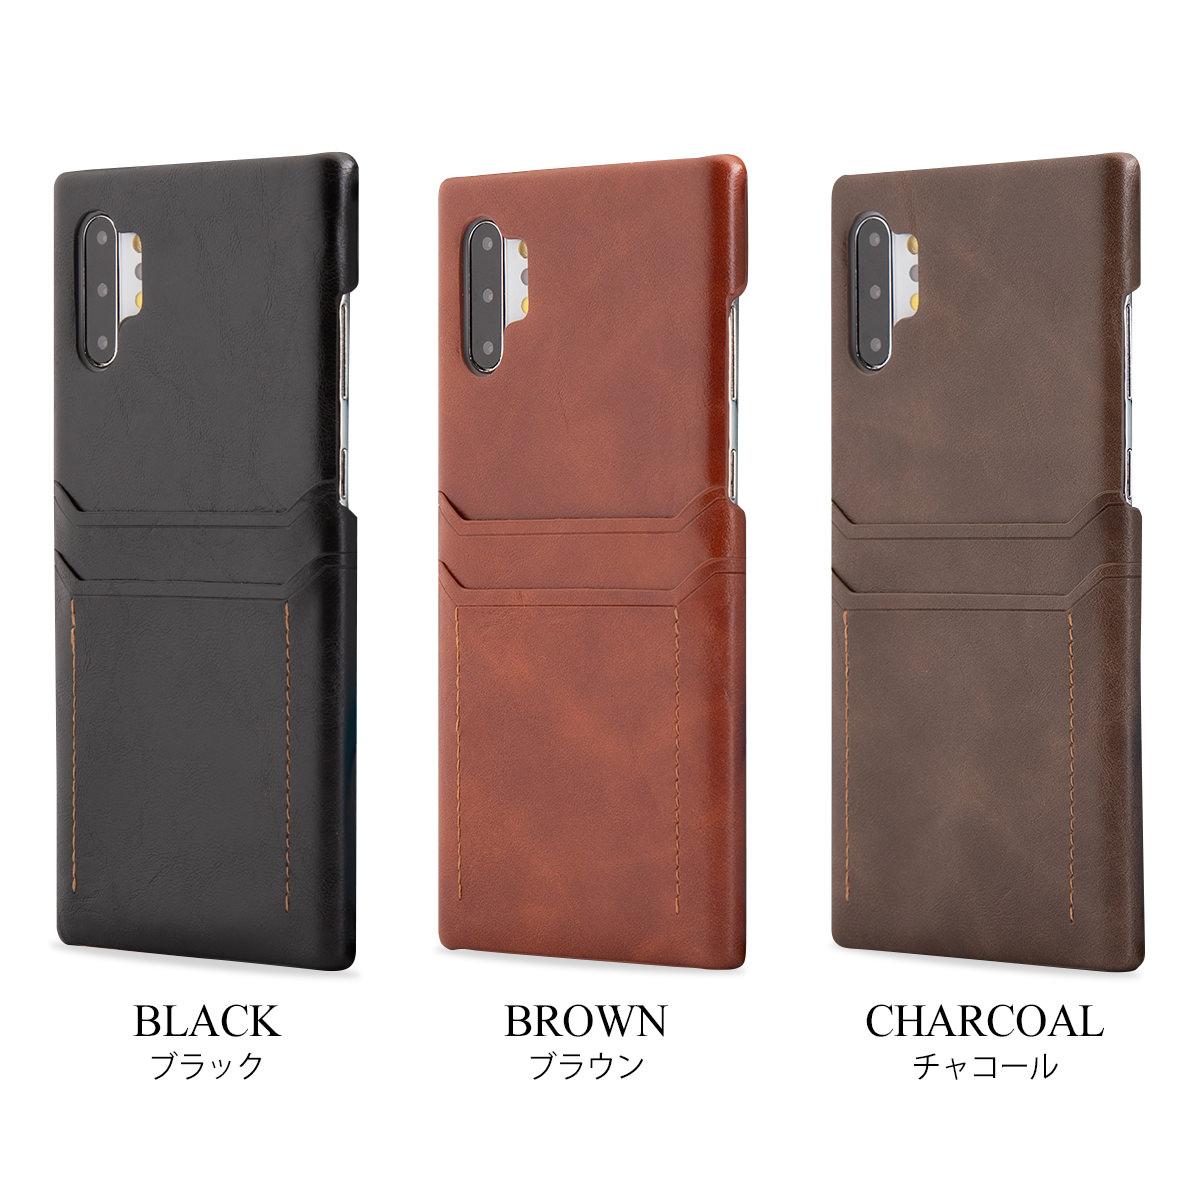 Galaxy Note10+ SC-01M SCV45 カードポケット付き レザー ハードケース ギャラクシー galaxy note10+ sc-01m scv45 note10プラス plus